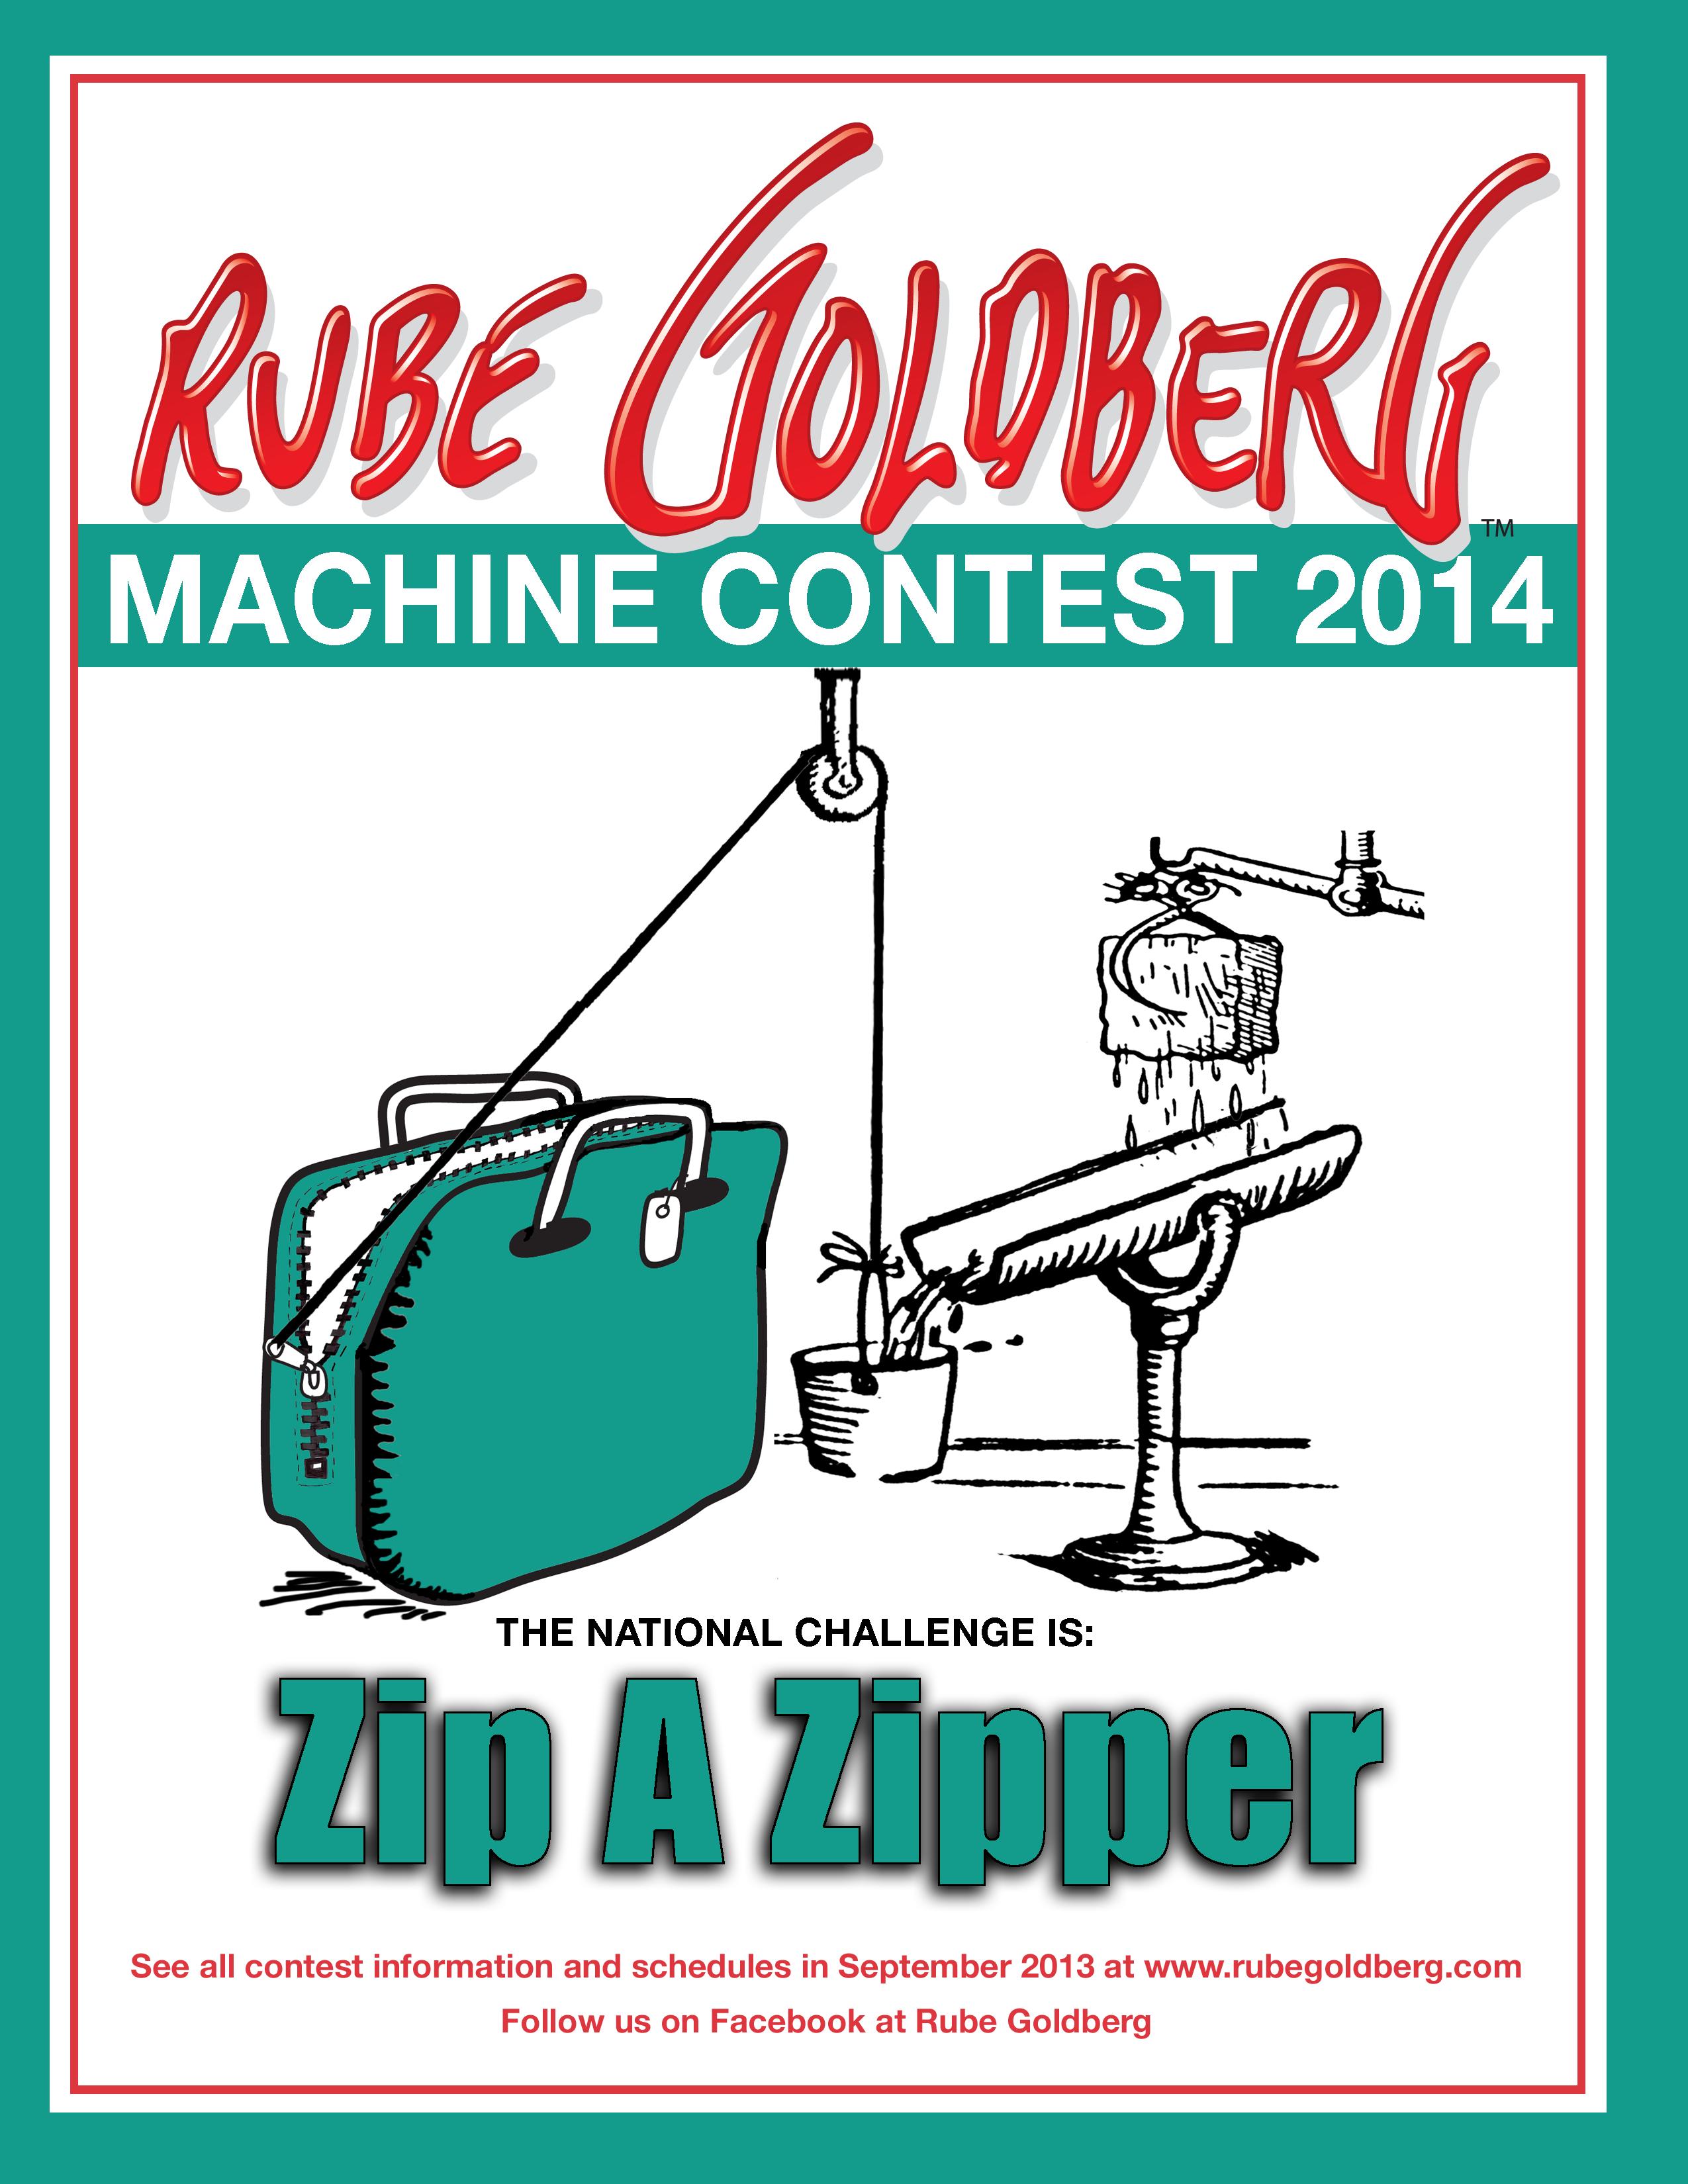 Rube Goldberg Home Of The Official Rube Goldberg Machine